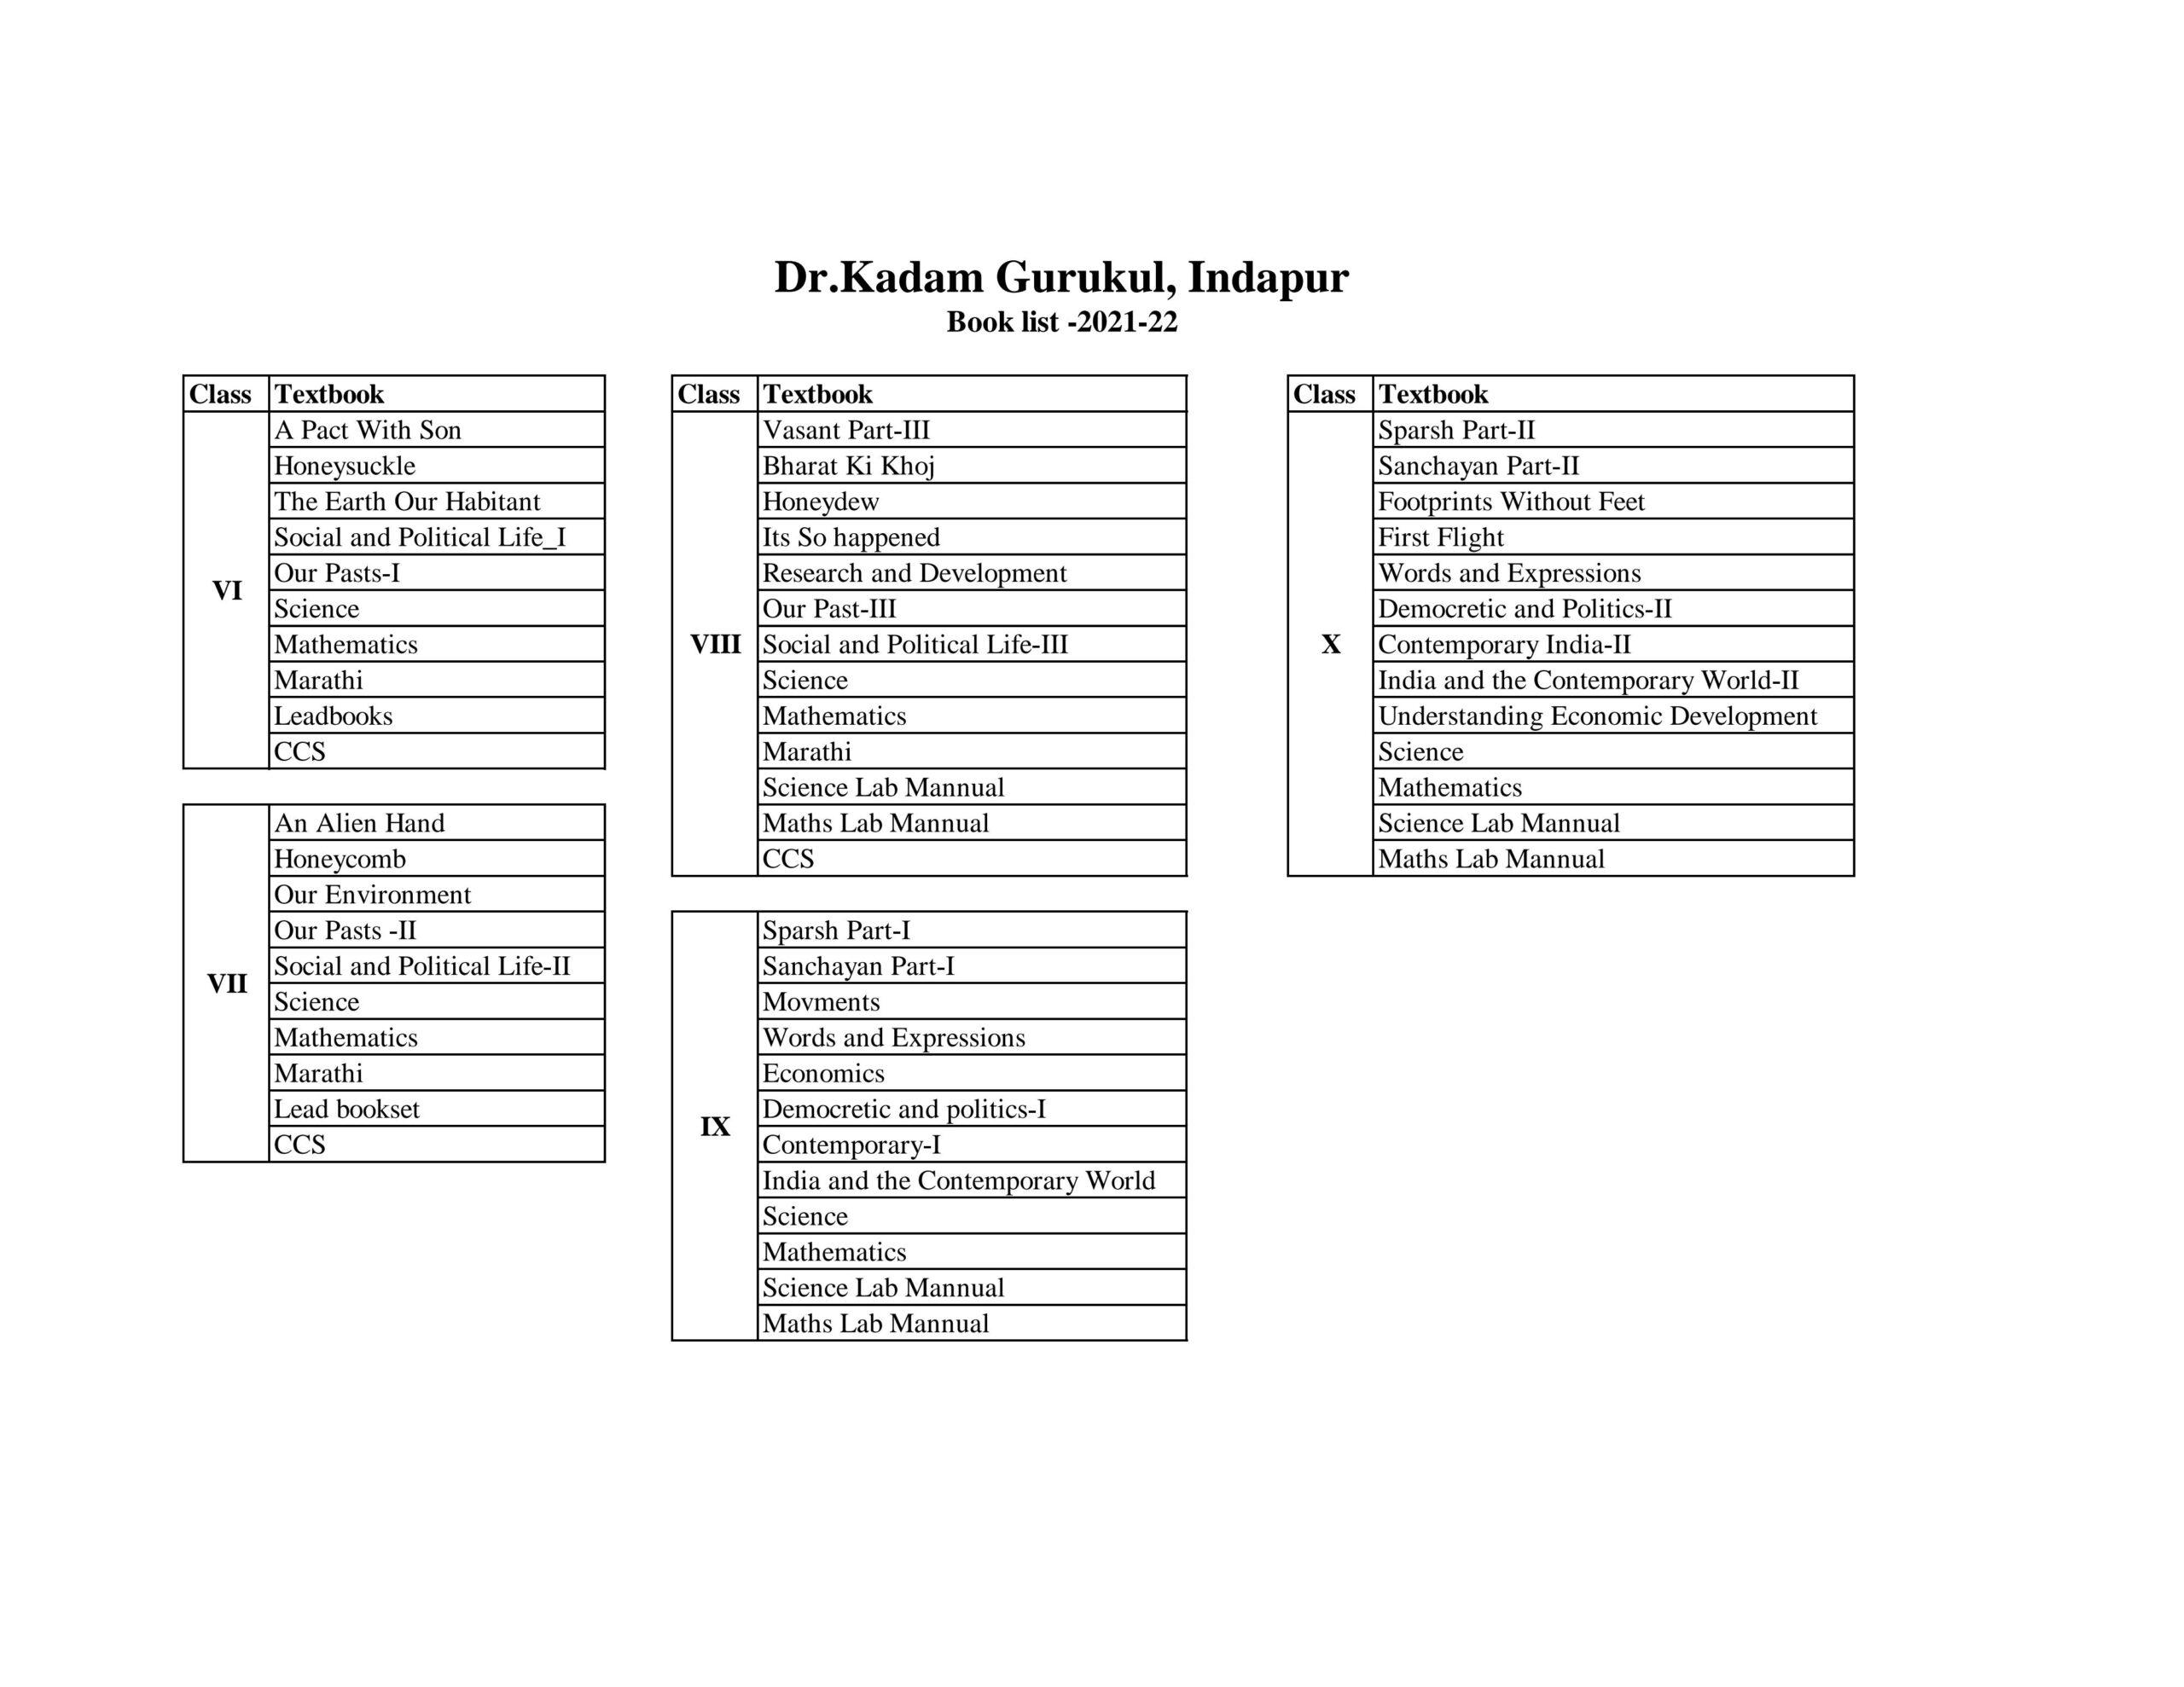 Textbook list 2021-22